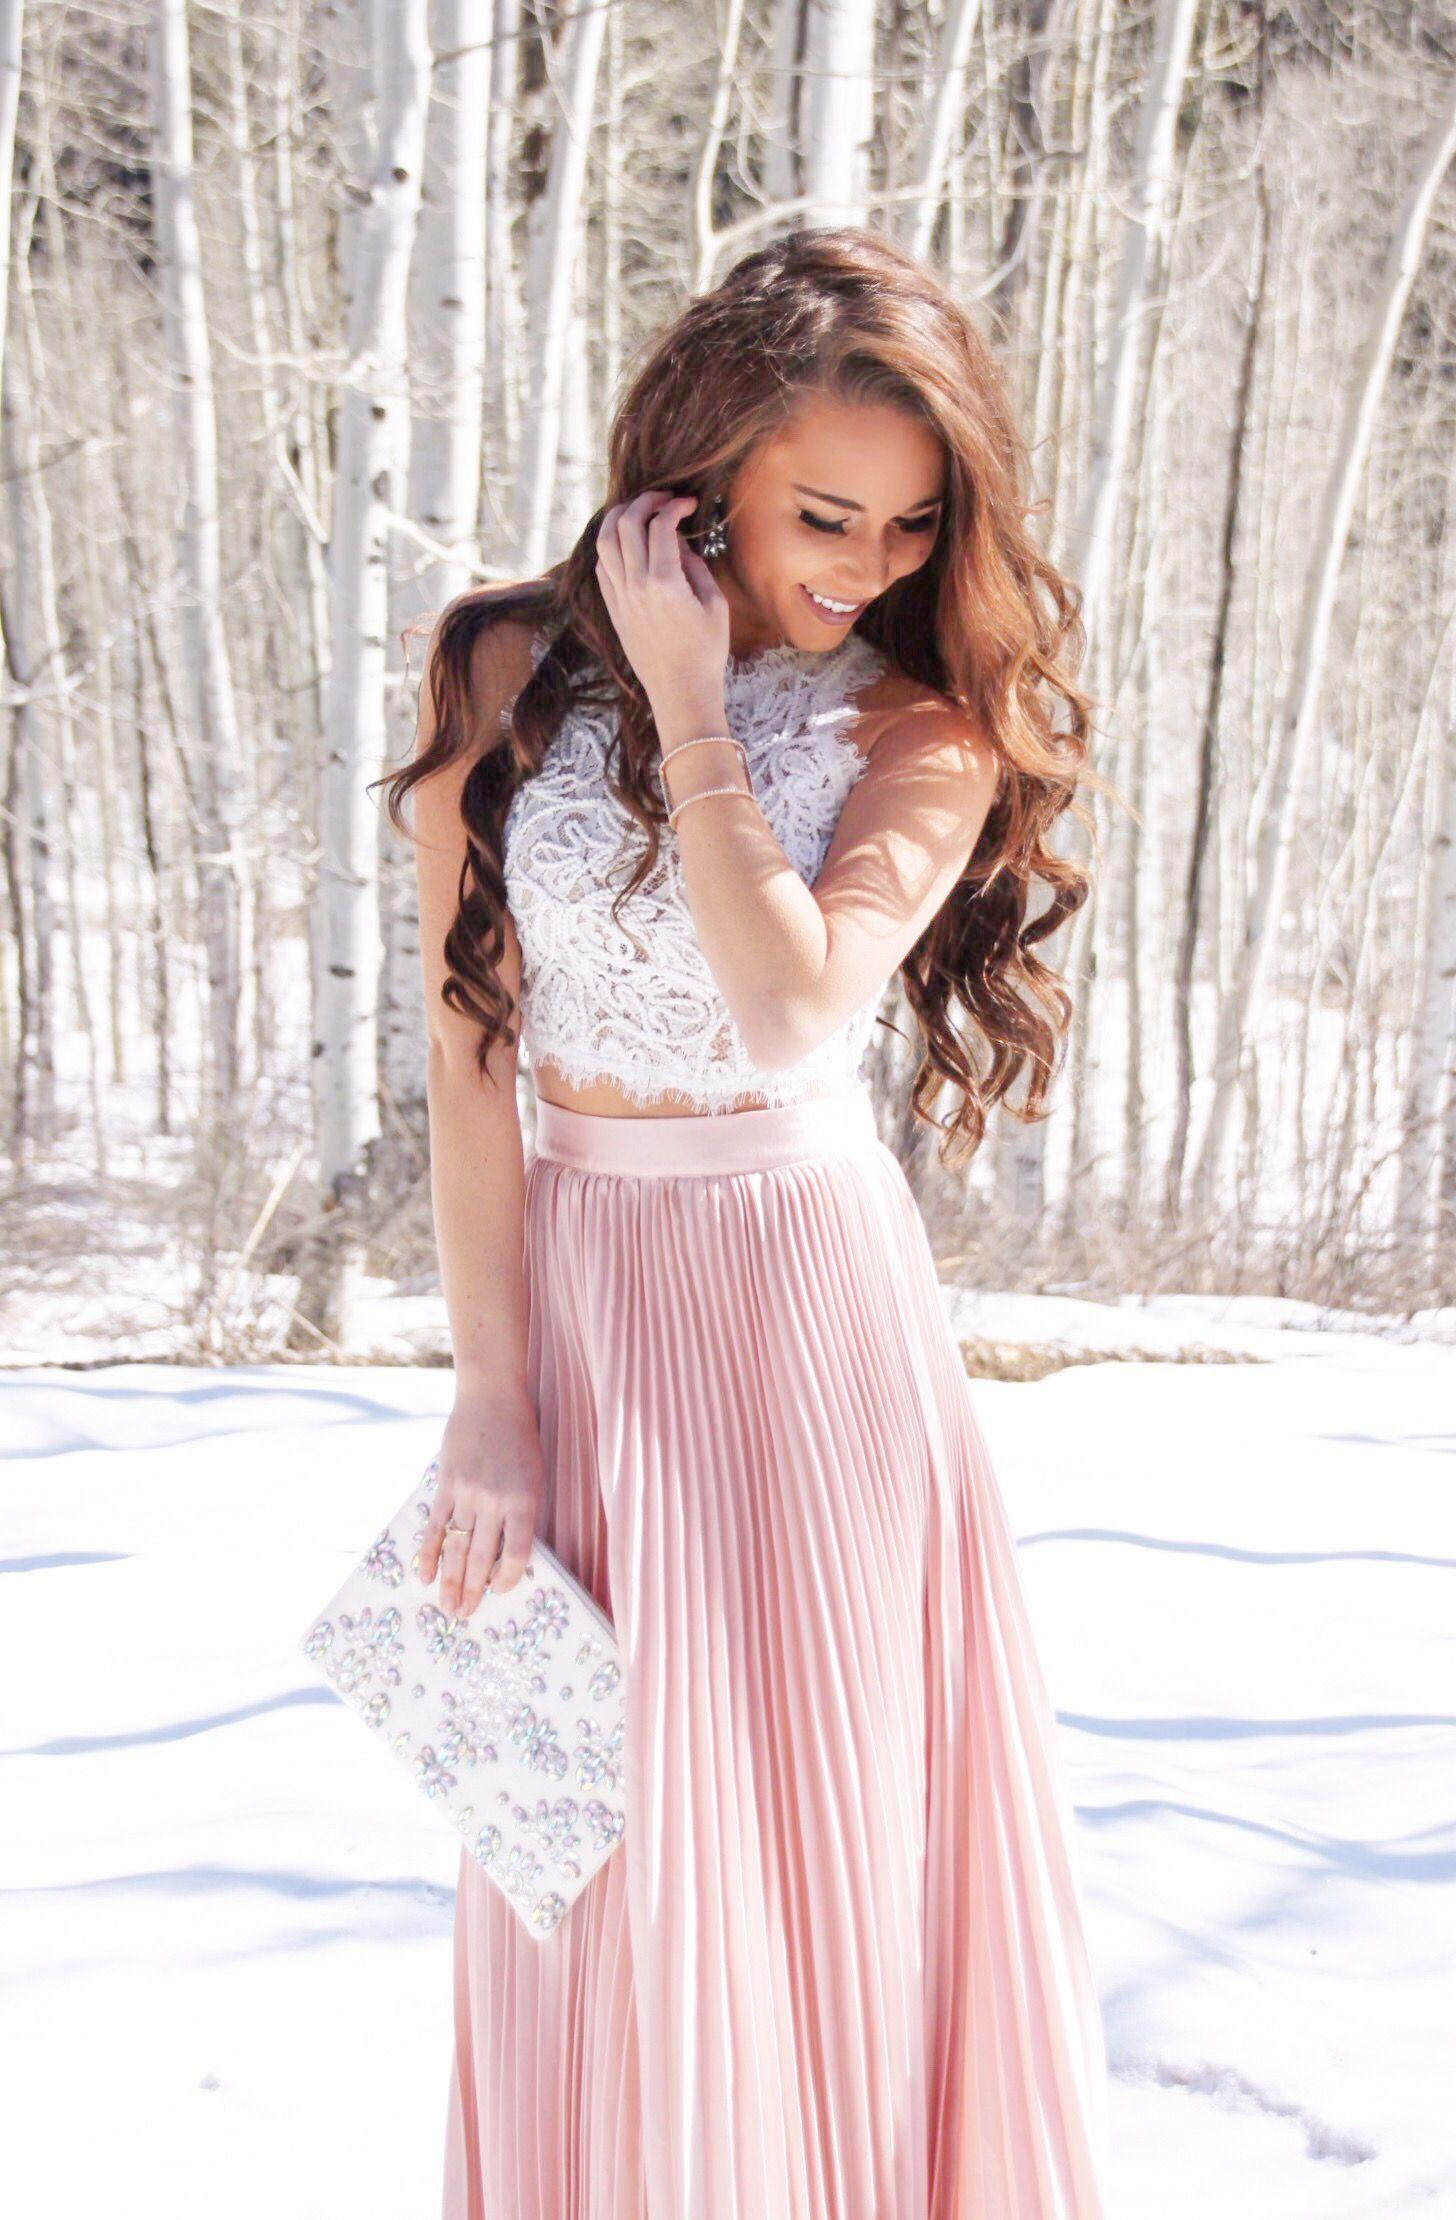 Lace Crop Top and Blush Pleated Maxi Under  30 - Sunshine   Stilettos Blog 4620c69442cf